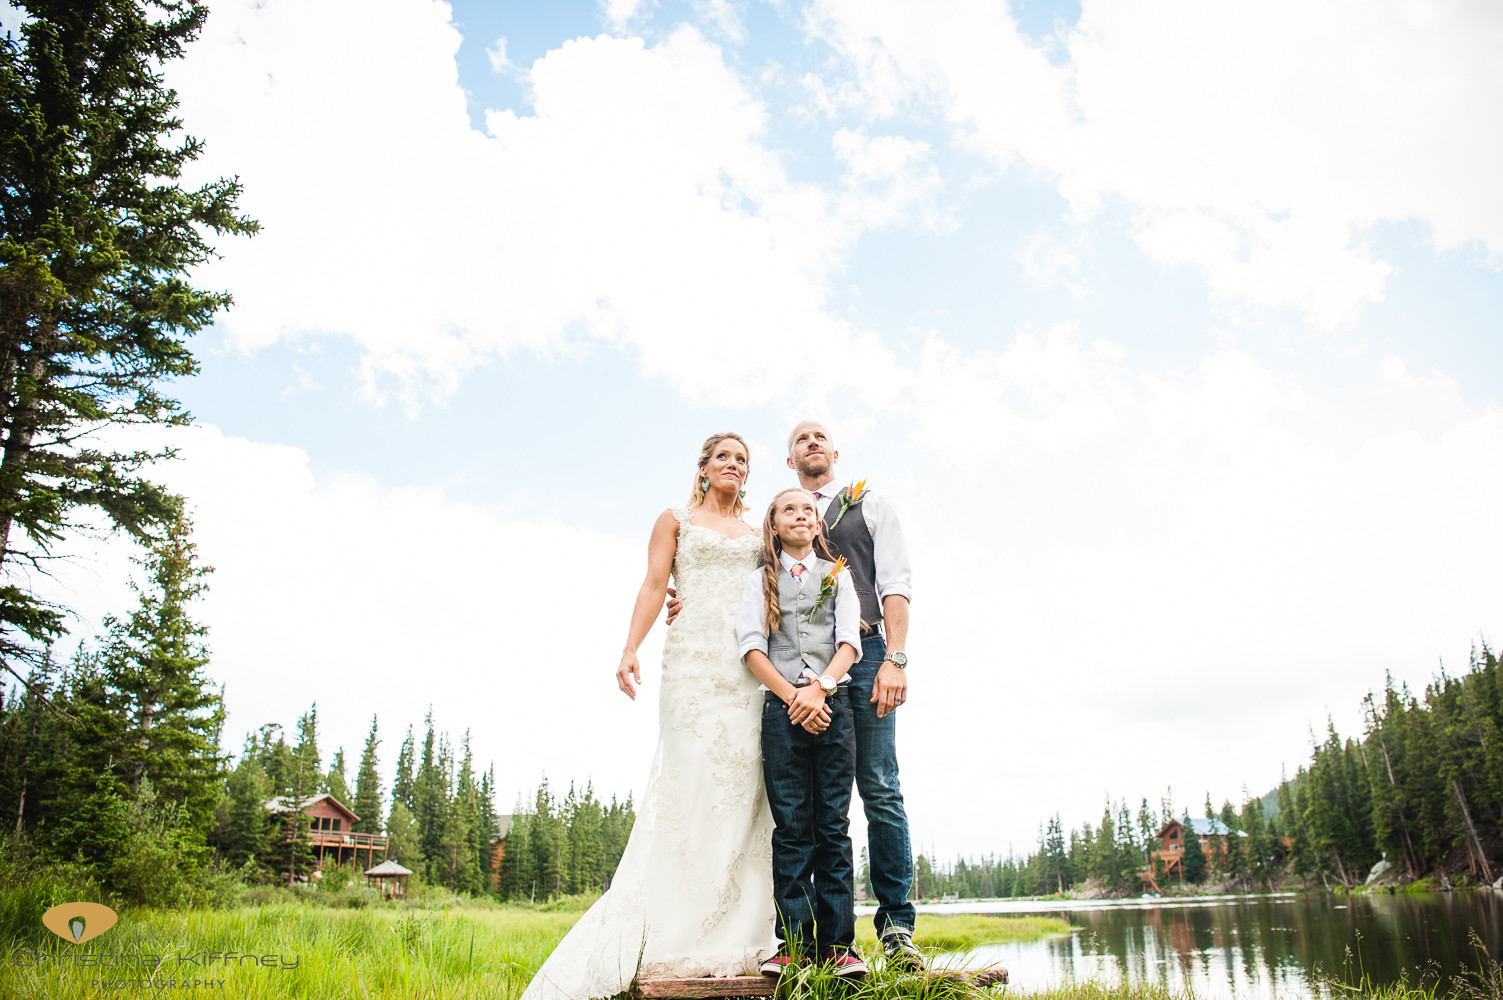 ckp-Colorado-Family-Elopement-0059.jpg